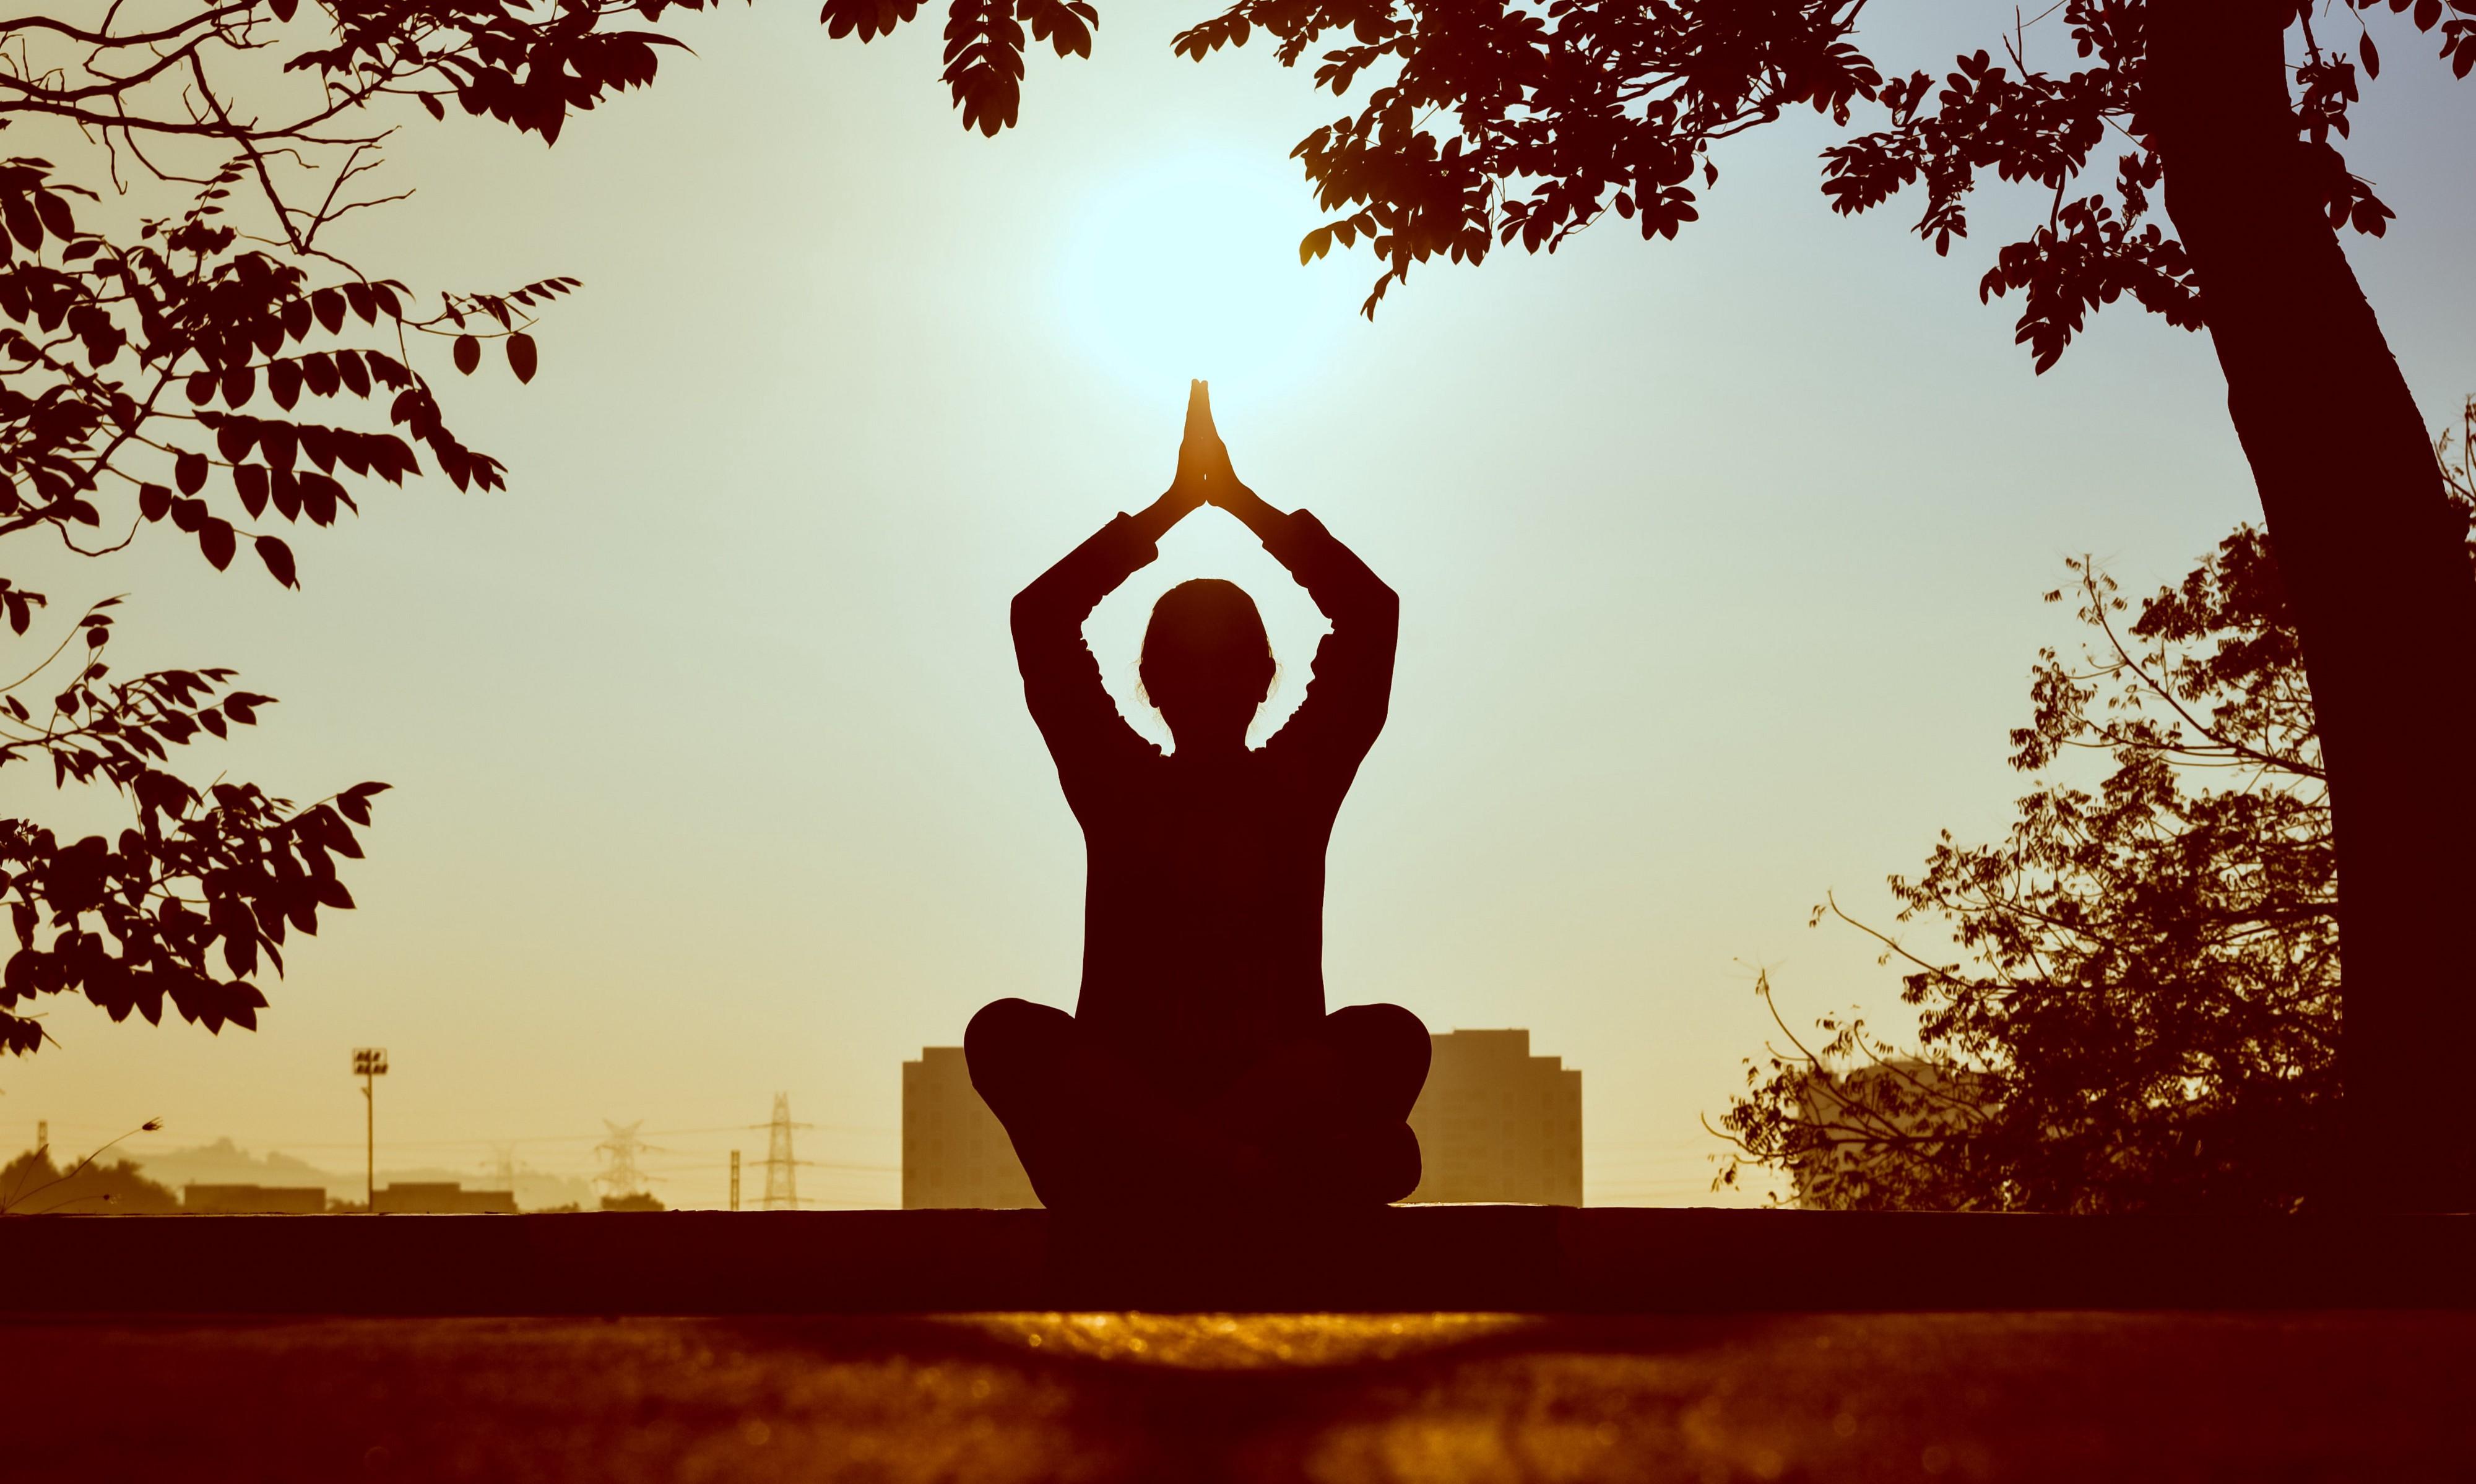 PunjabKesari, एकांतवास, Solitude, Spiritual, Spiritual practice, Religious Story, Religious Concept, Motivational Theme, Motivational Concept, Punjab Kesari, Dharm, Joys of meditation